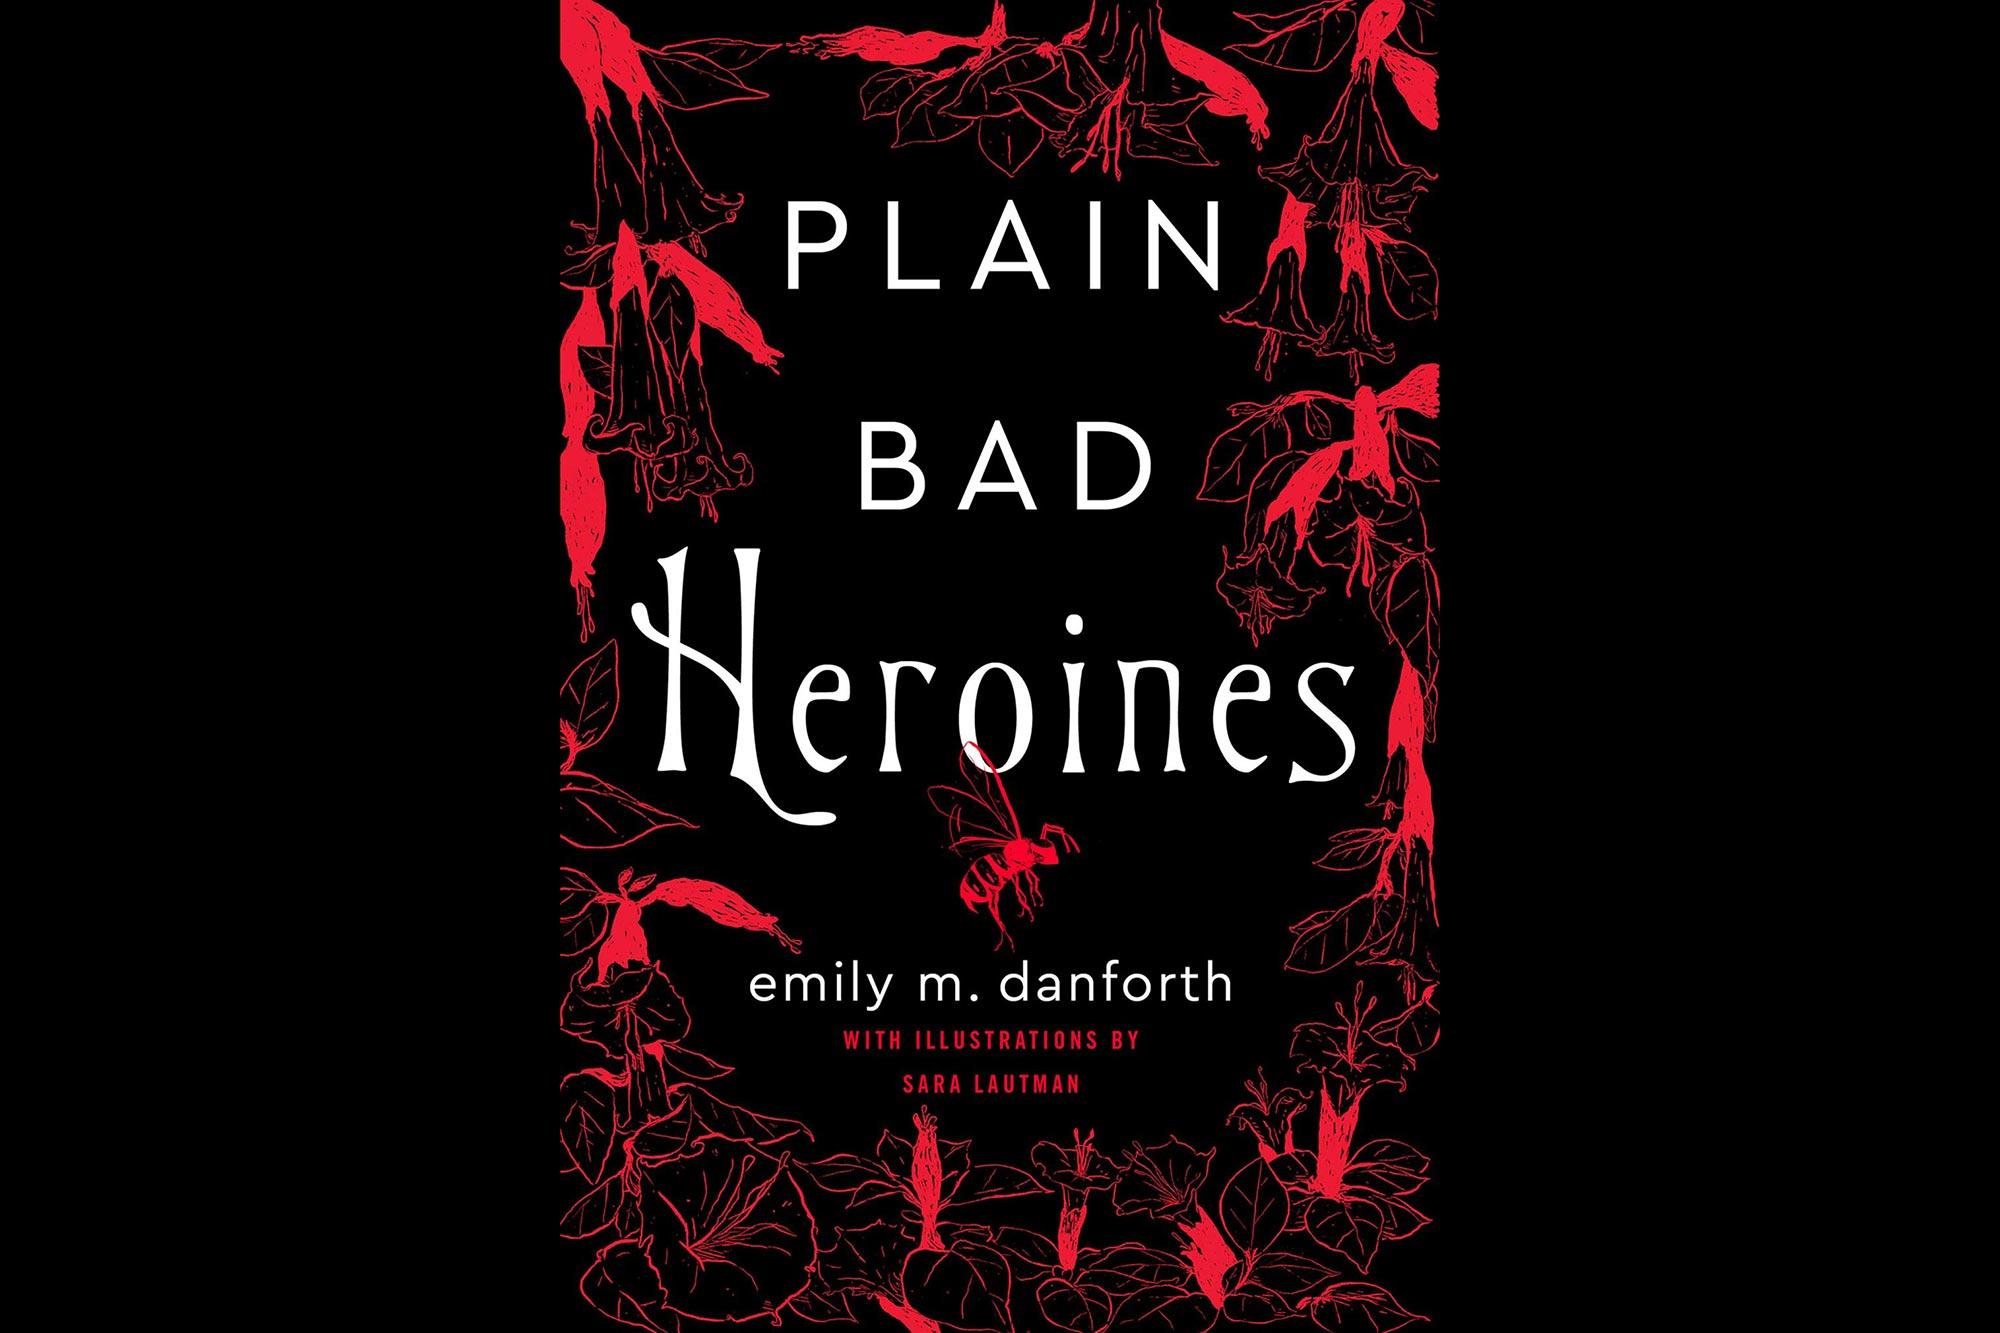 Plain Bad Heroines: A Novel  by Emily M. Danforth